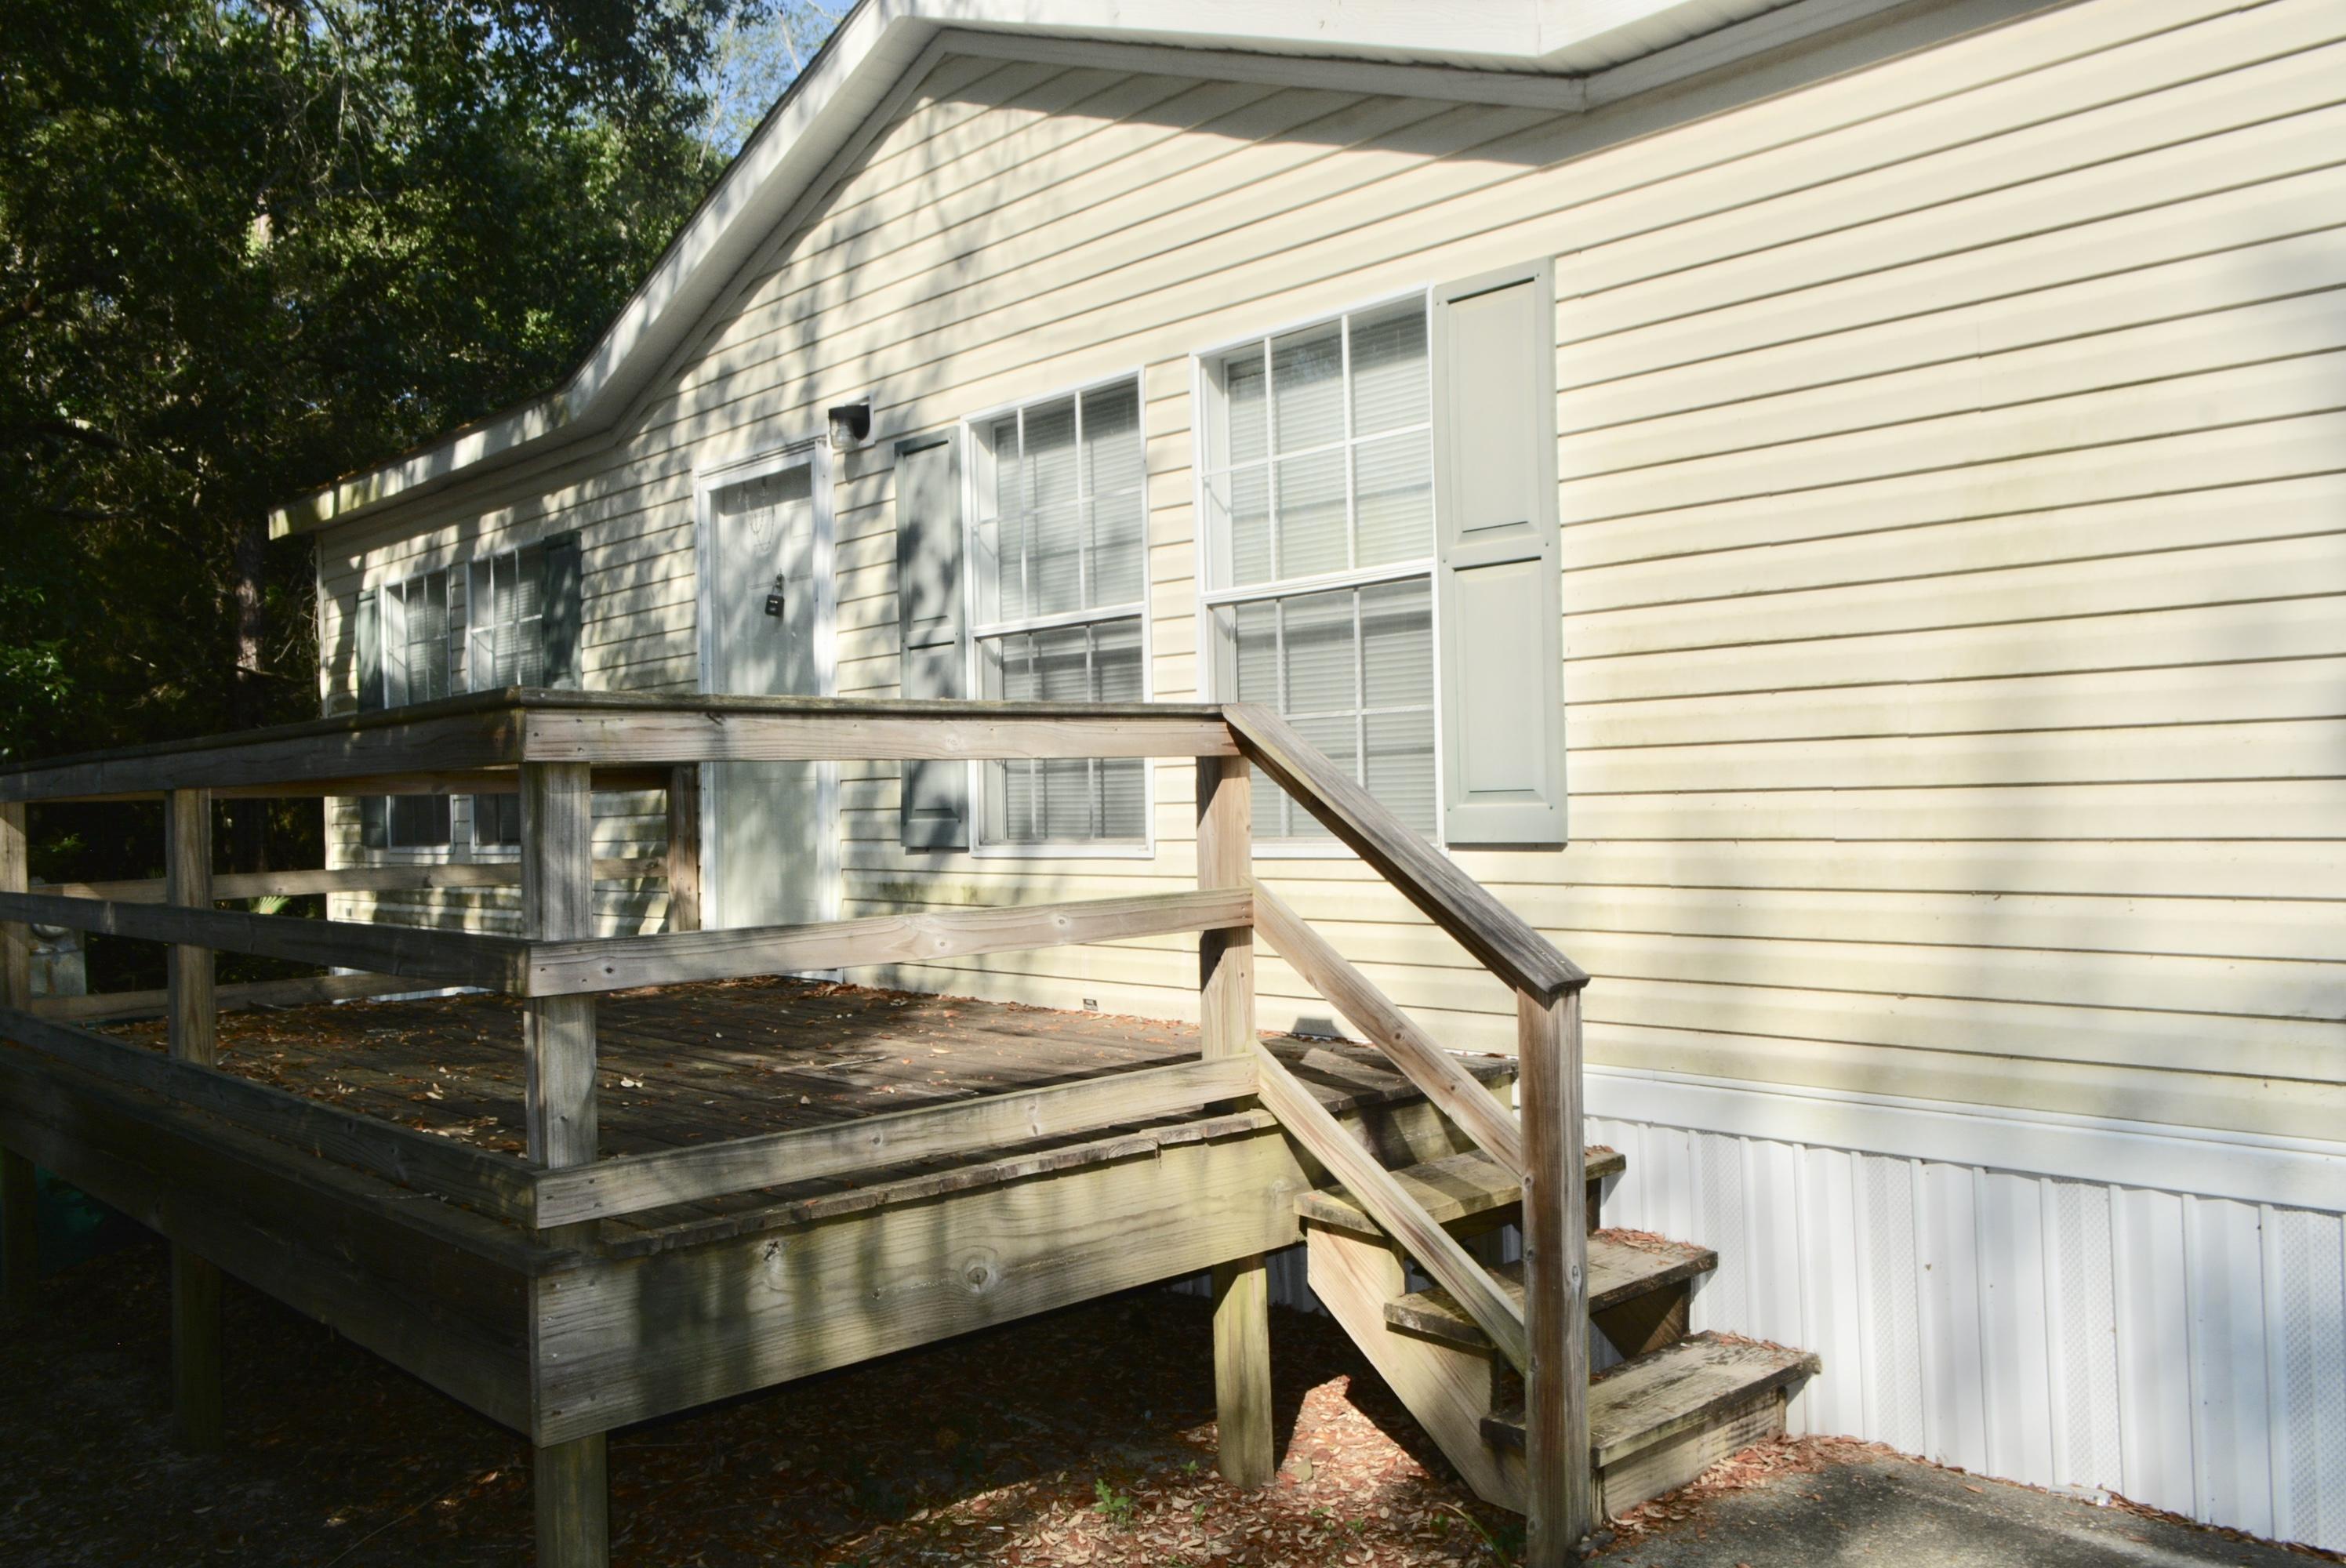 A 3 Bedroom 2 Bedroom Bayshore Villas Mobile Home Community Townhome